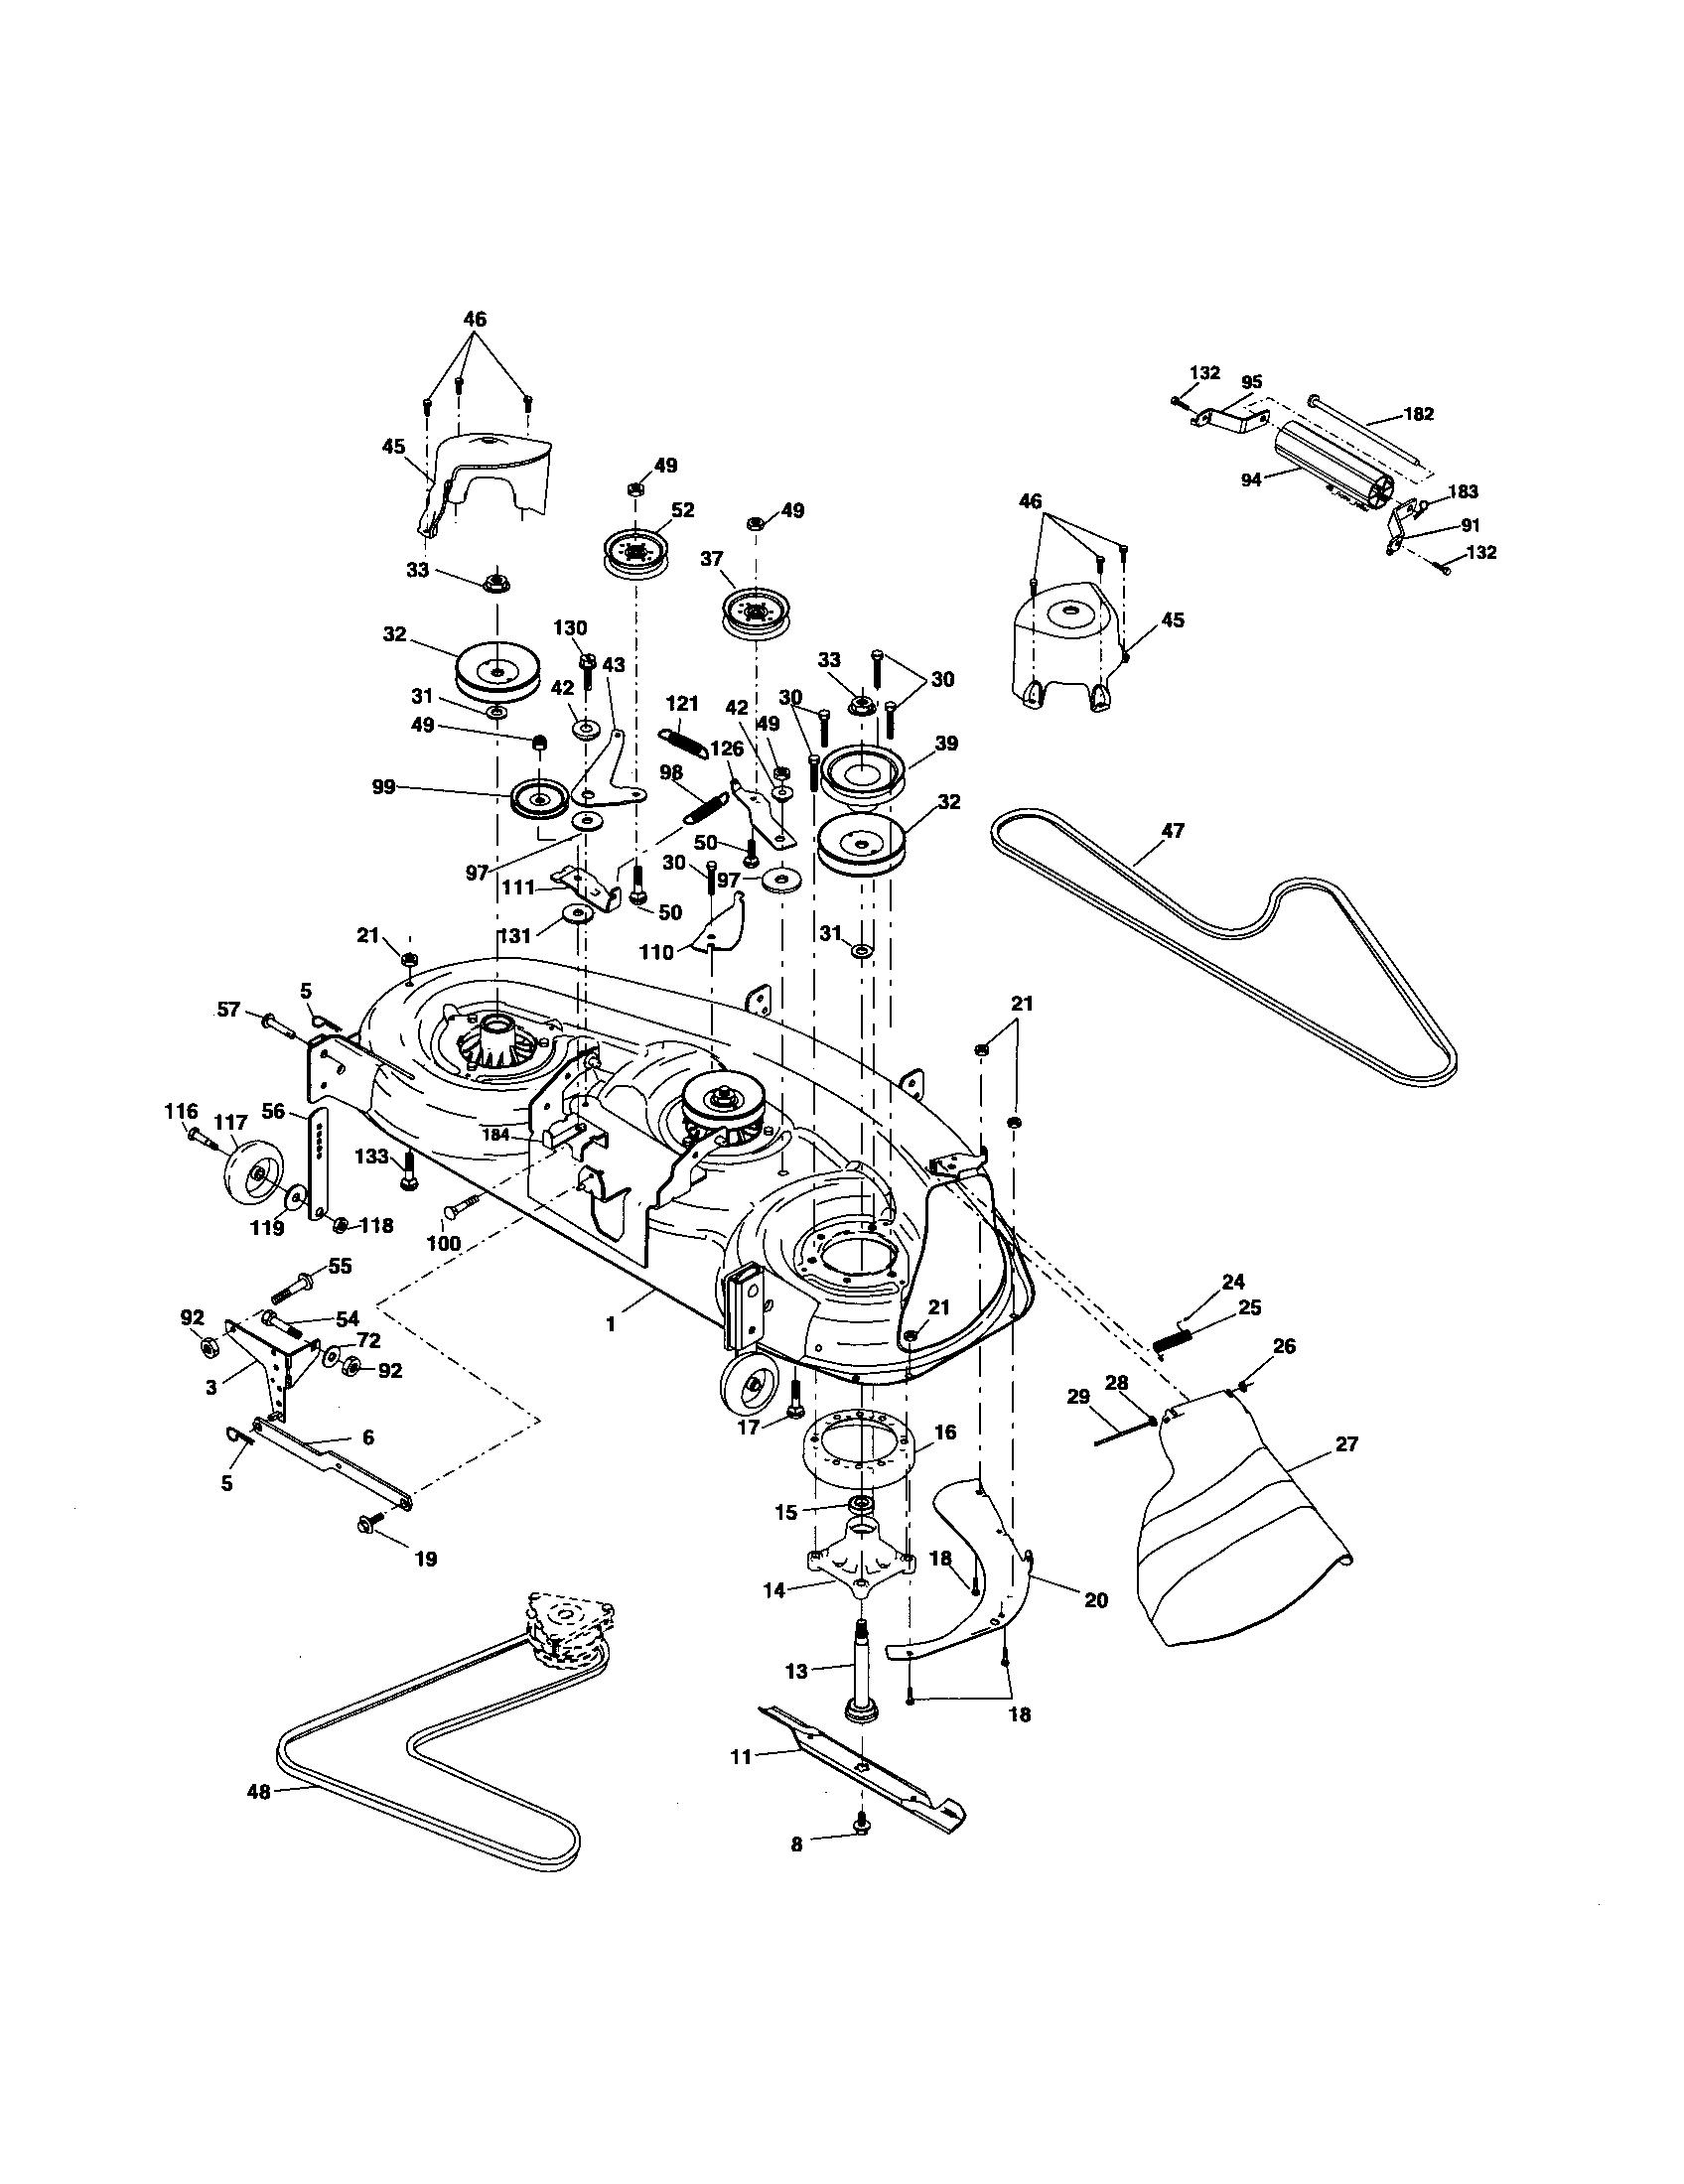 wiring diagram for husqvarna yth 2448 lawn mower